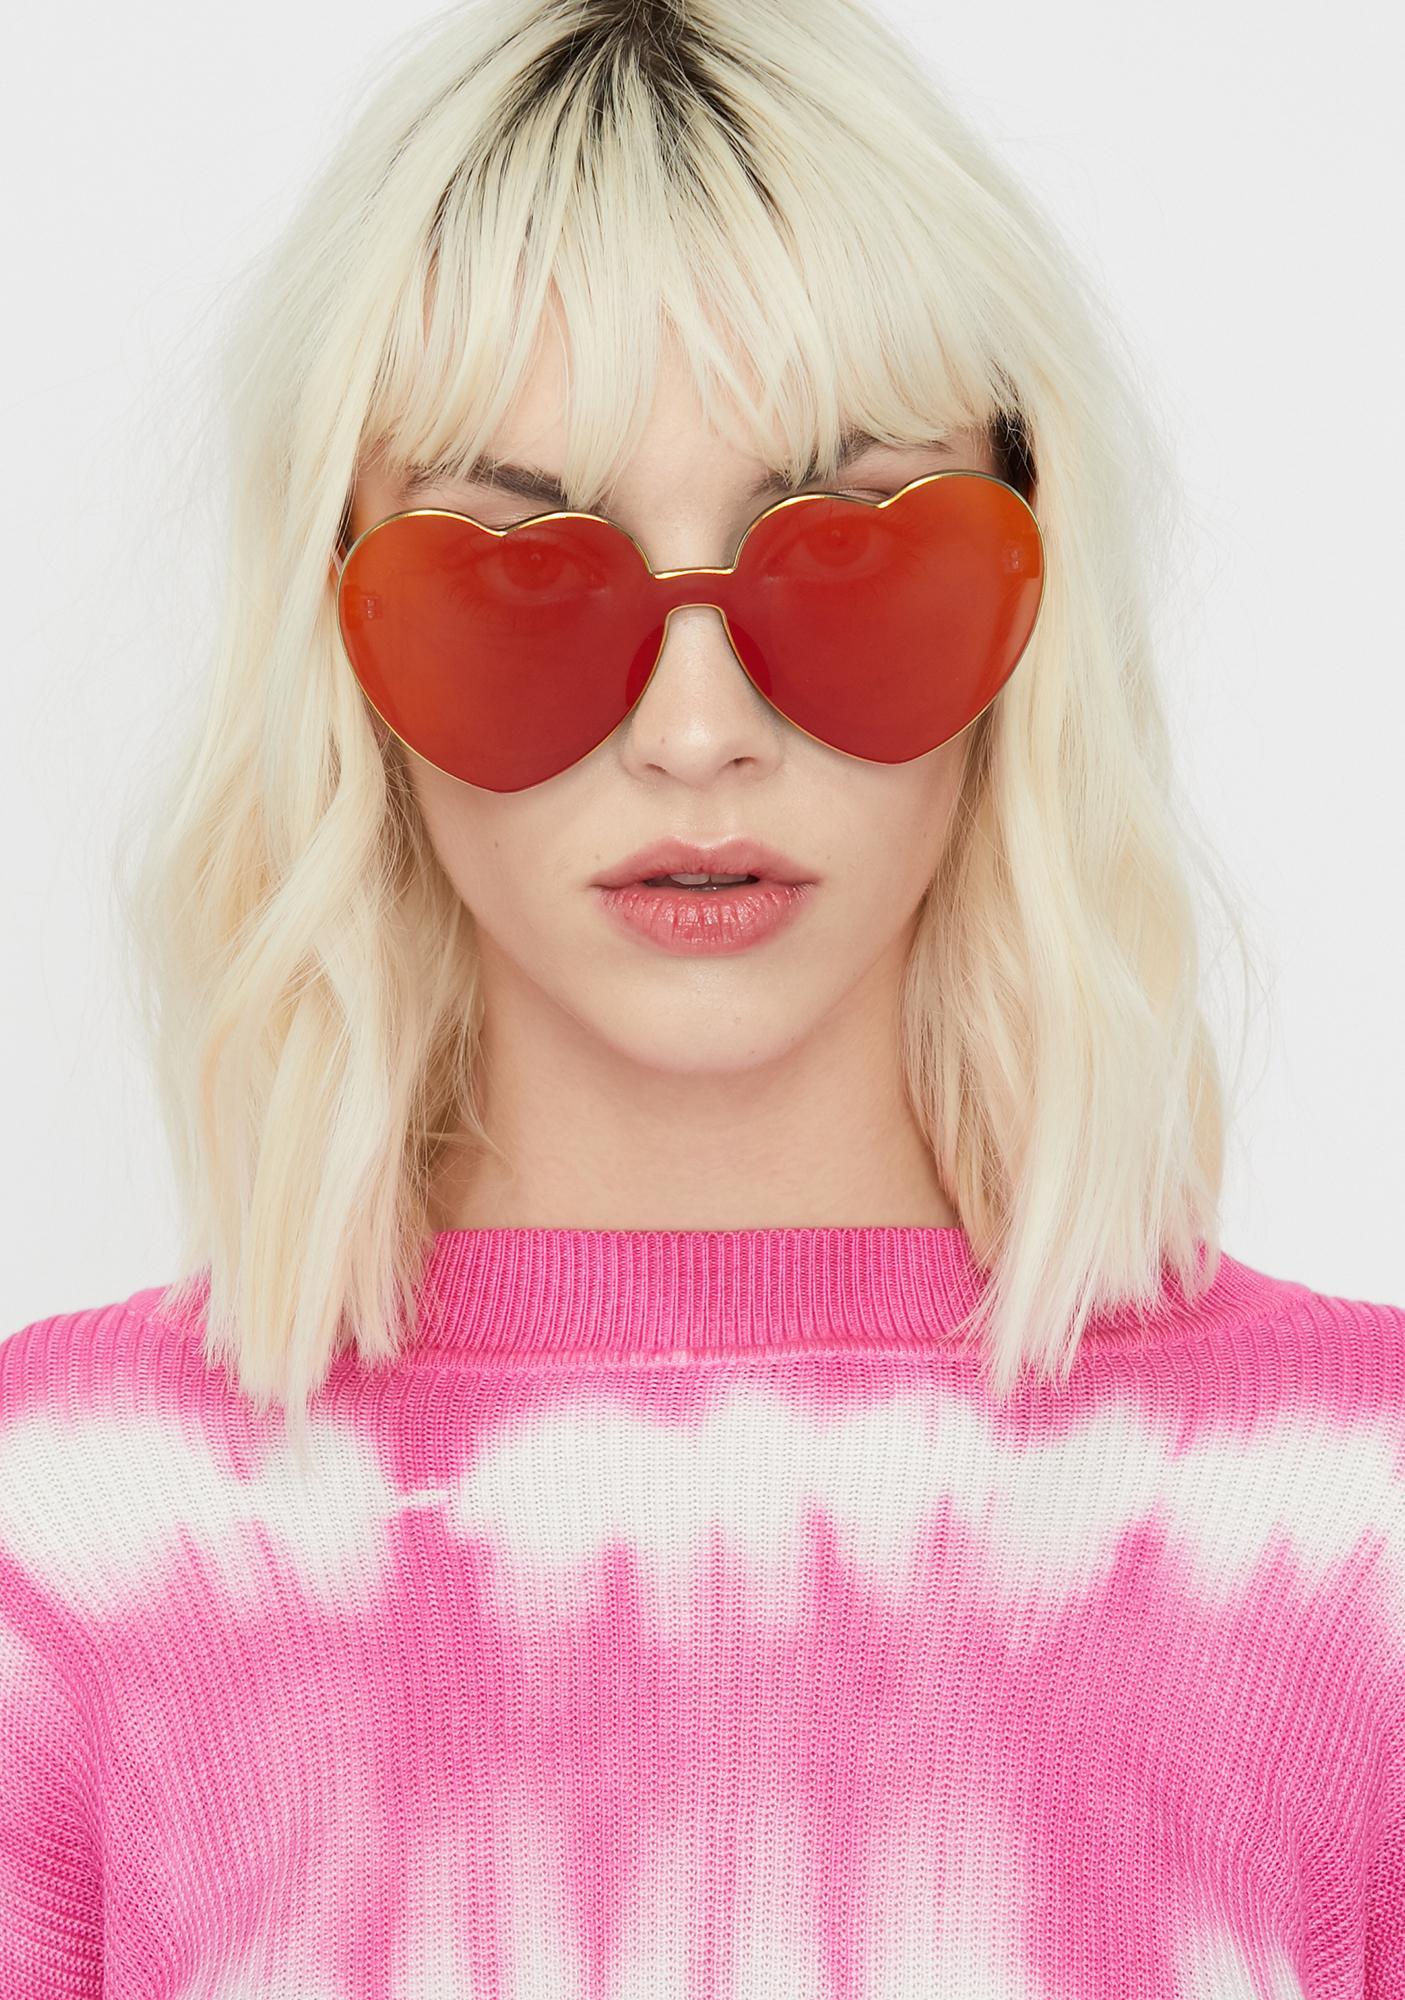 Diet Dew Heart Sunglasses